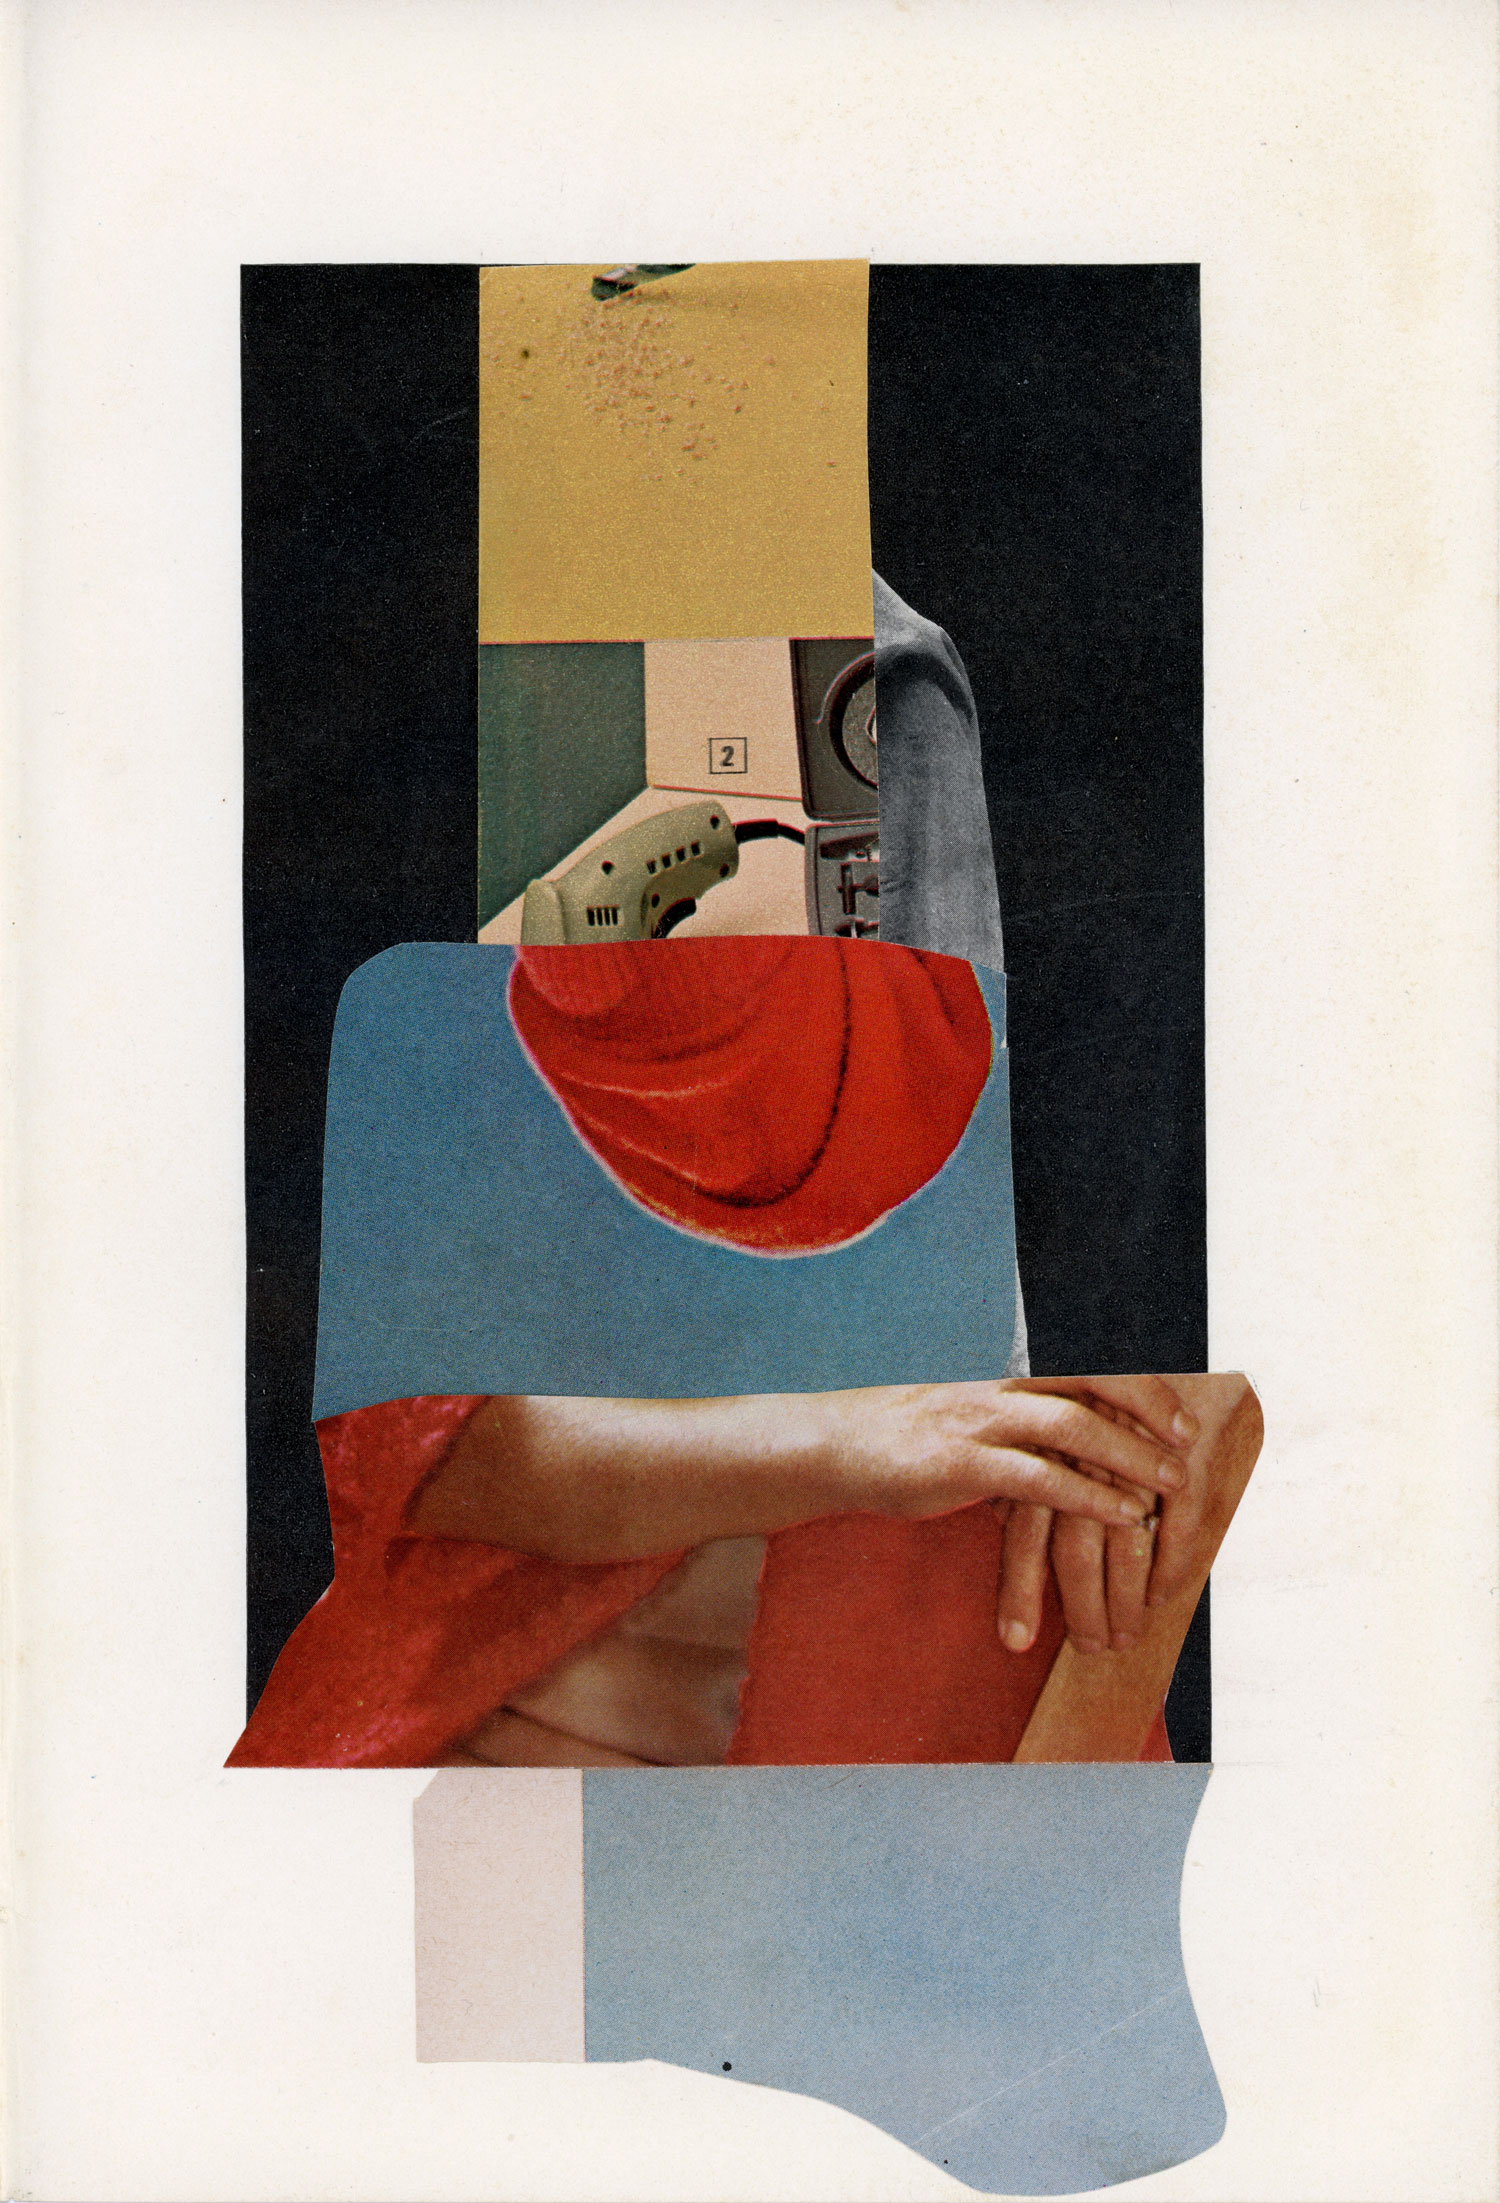 john-gall-collage-art-2001.jpg